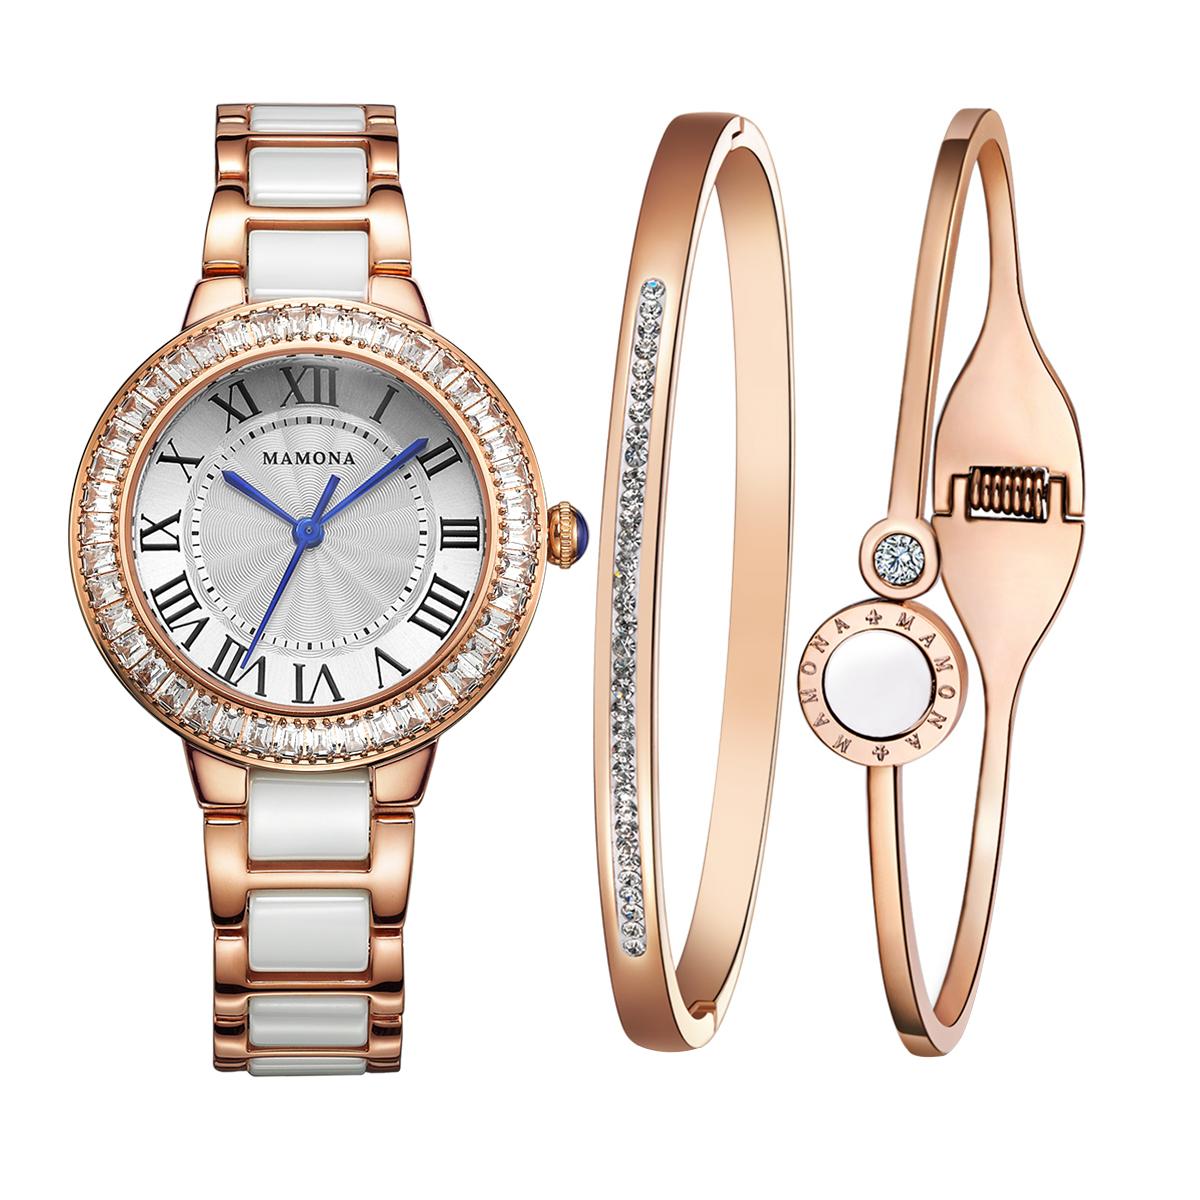 Mamona Women S Watch Bracelet Gift Set L68008rggt Mamona